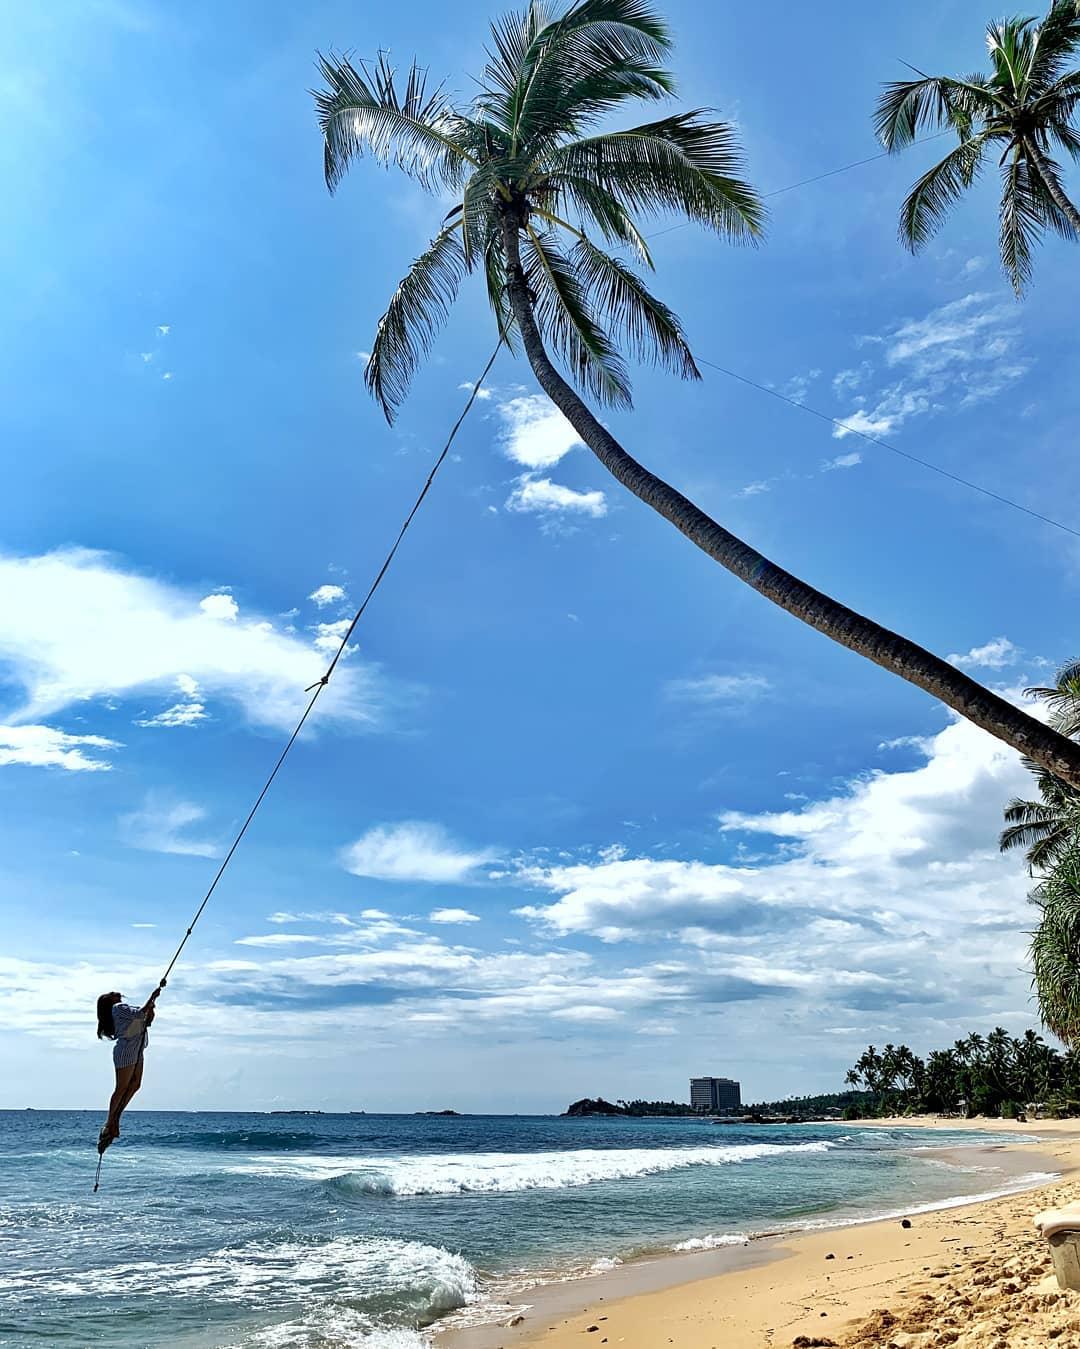 Unawatuna swing how to reach